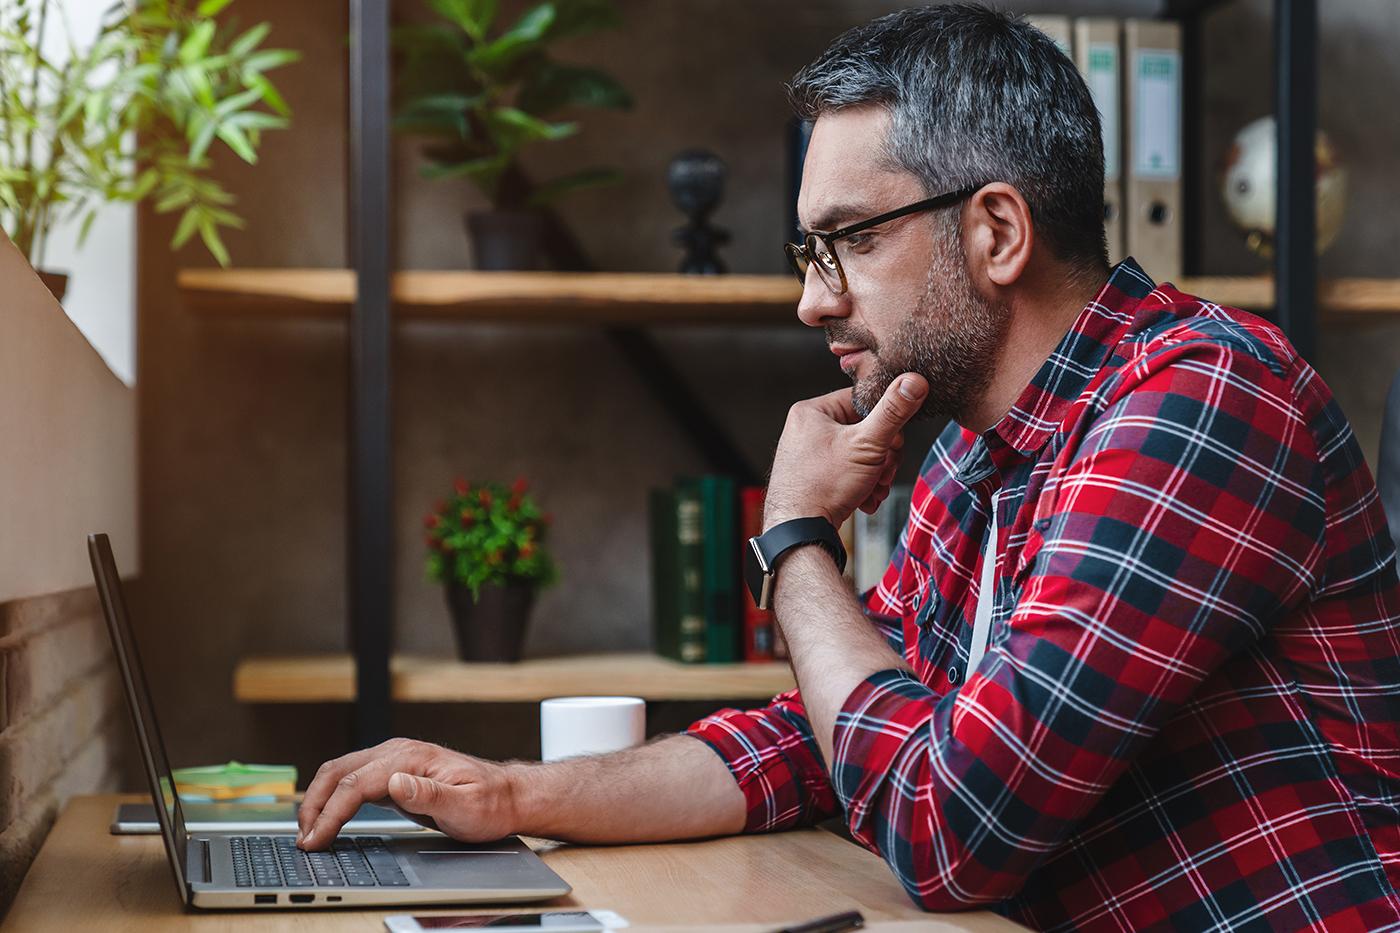 man at desk working on laptop